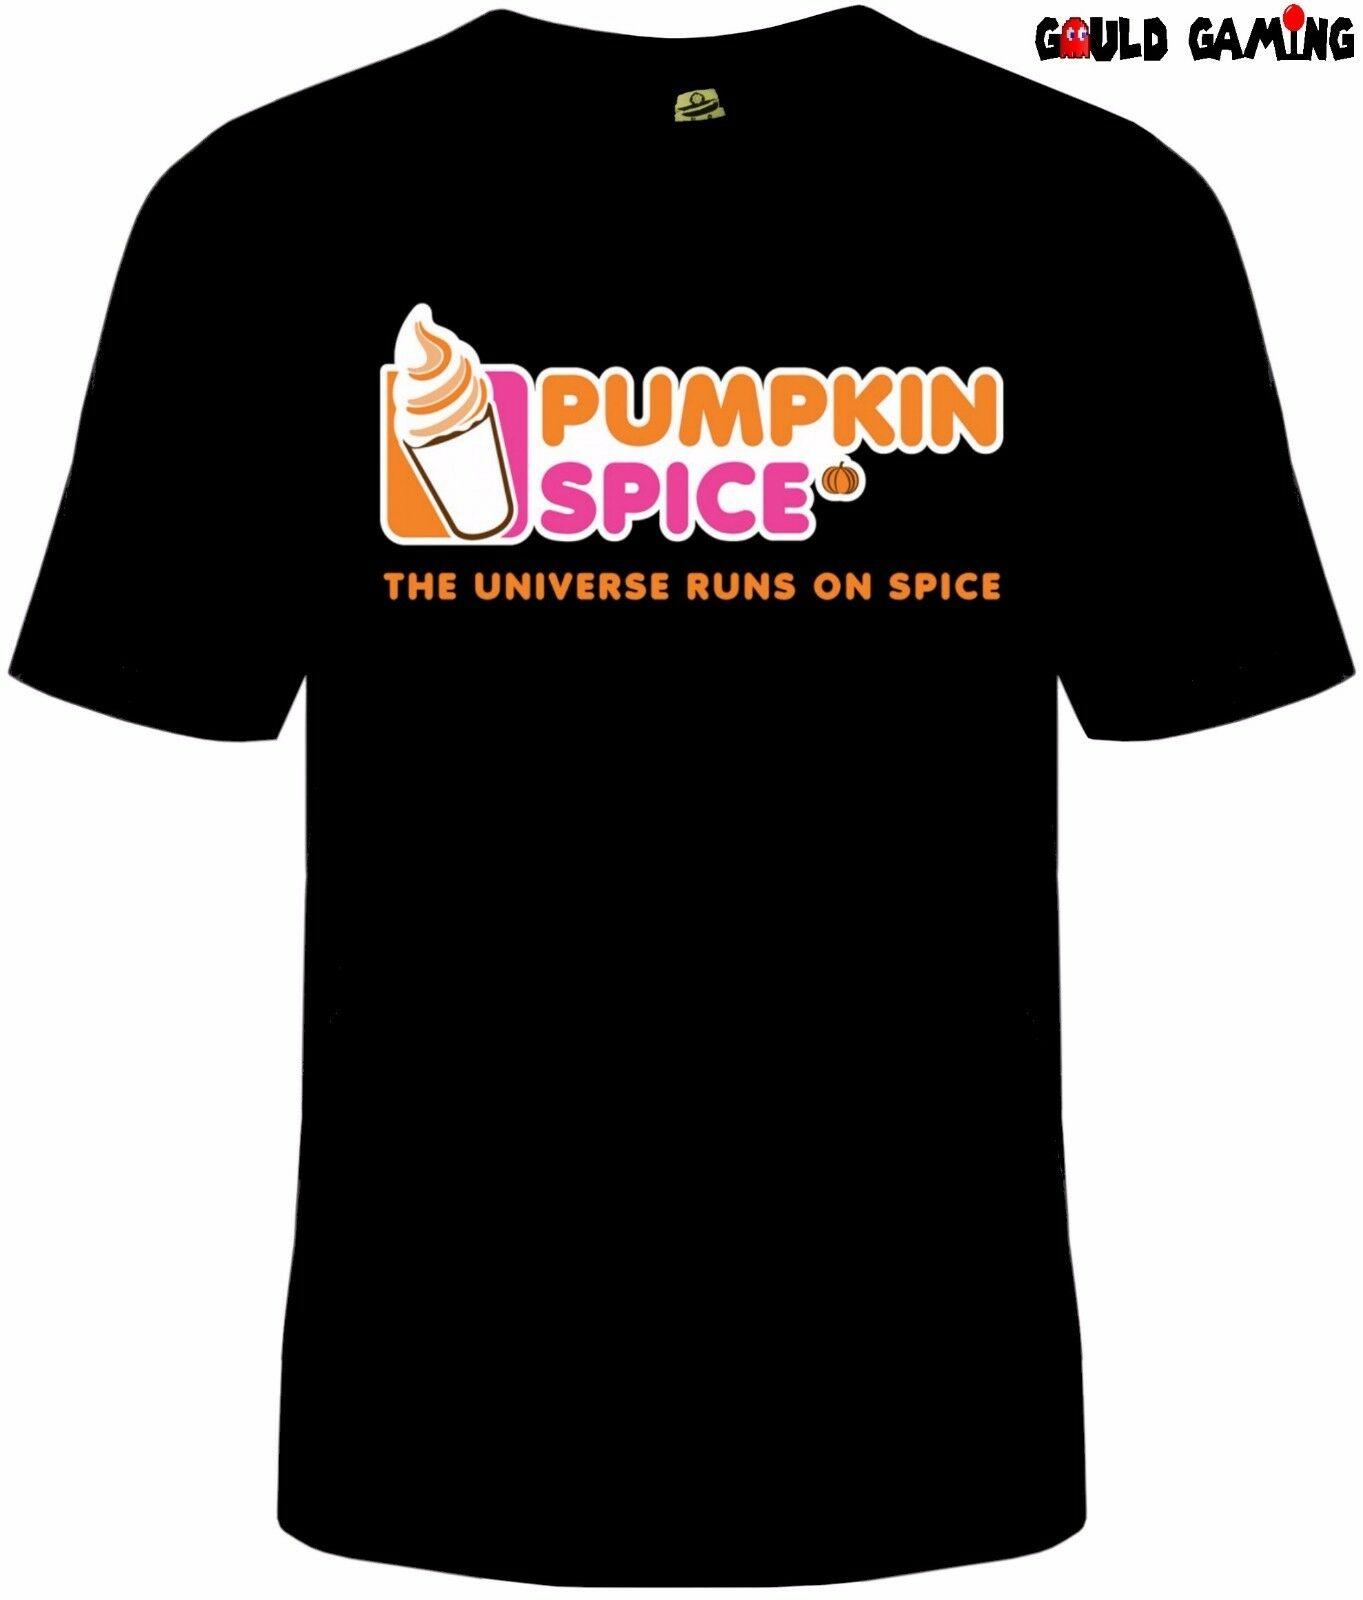 Pumpkin Spice Dunkin Donuts T Shirt Unisex Funny Coffee Halloween Sizes Fall New